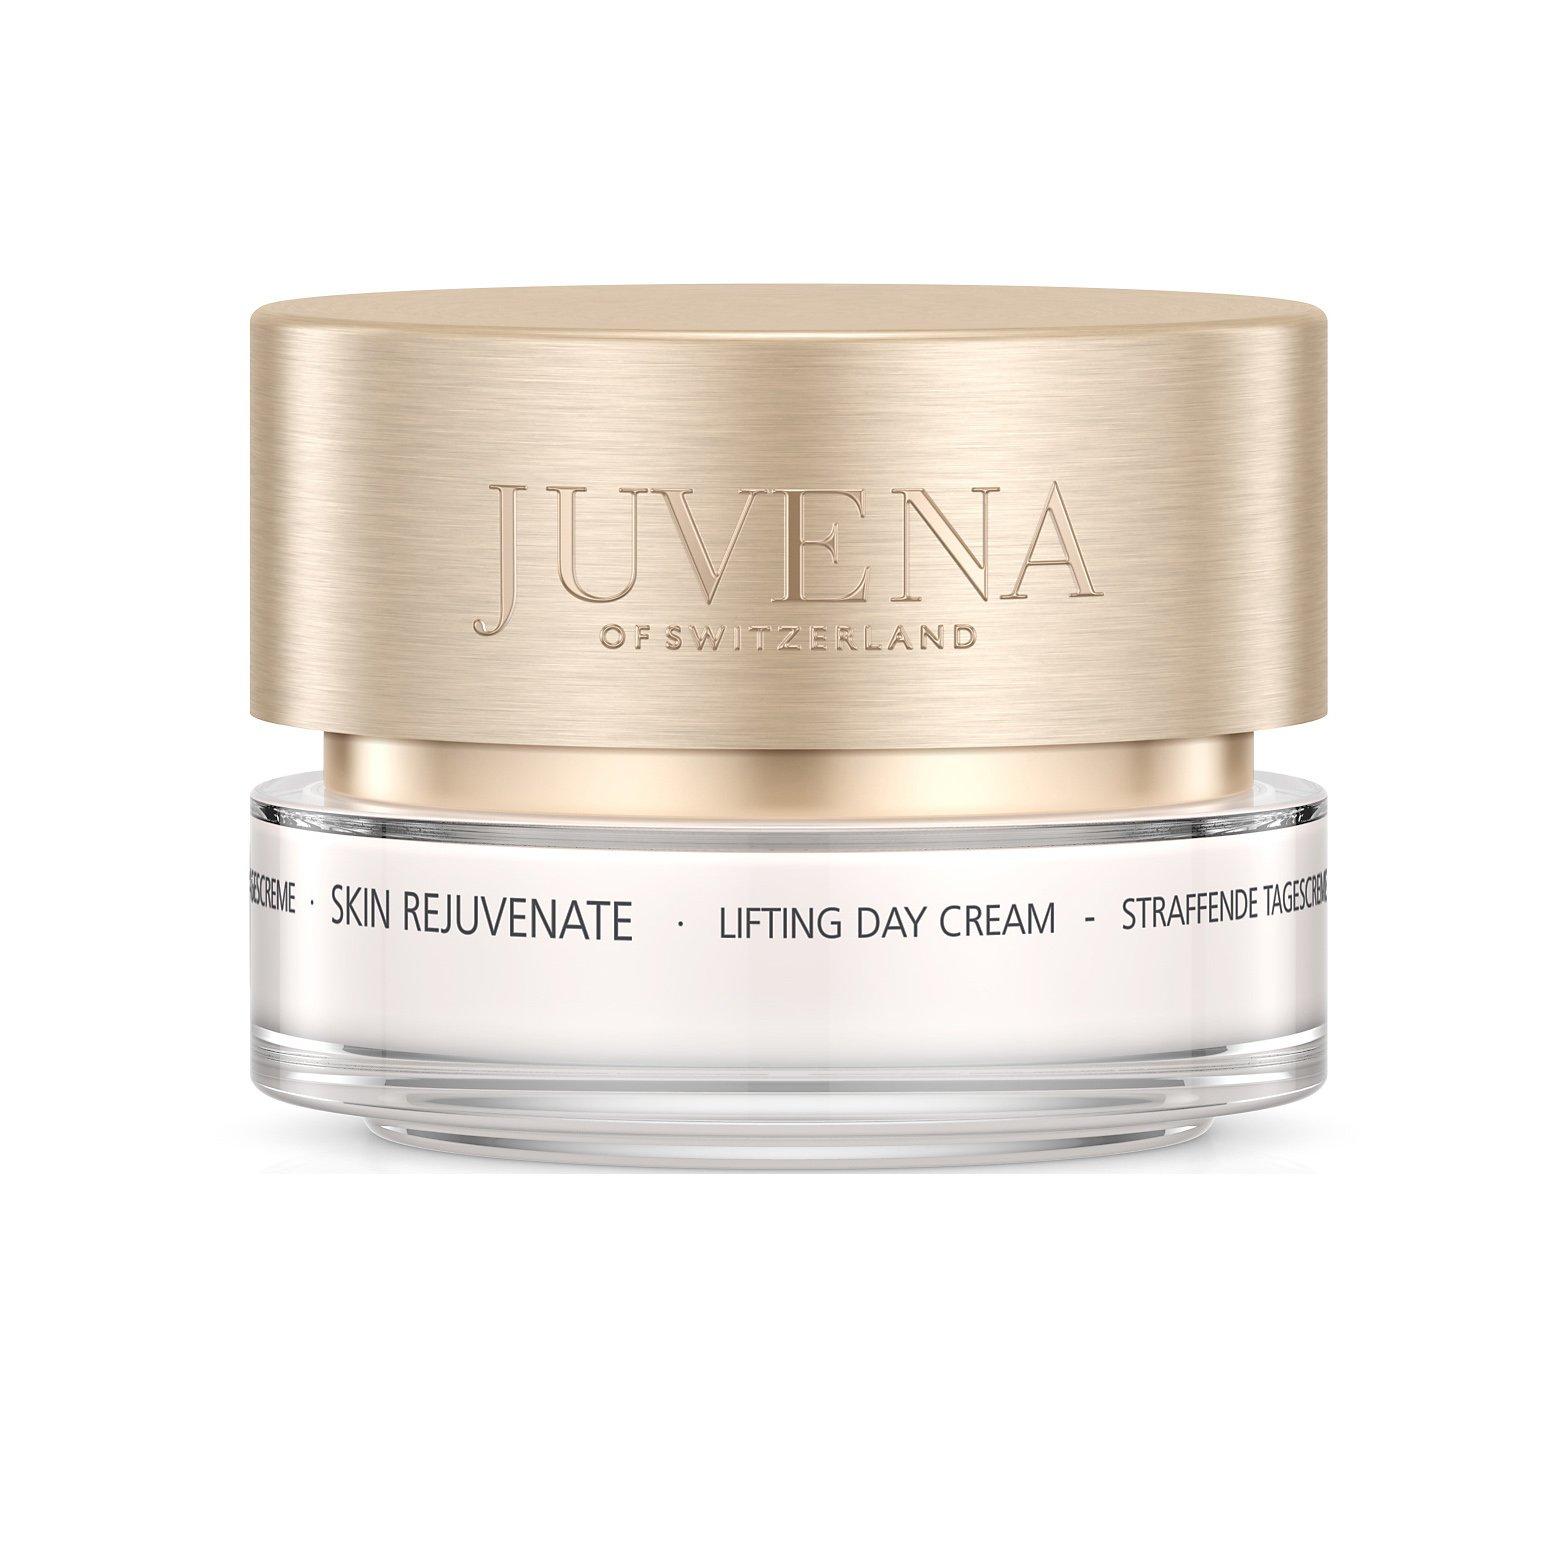 Juvena Skin Rejuvenate Lifting Day Cream Normal to Dry Κρέμα Ημέρας που Συσφίγγει Ορατά το Δέρμα & Σμιλεύει το Περίγραμμα 50ml